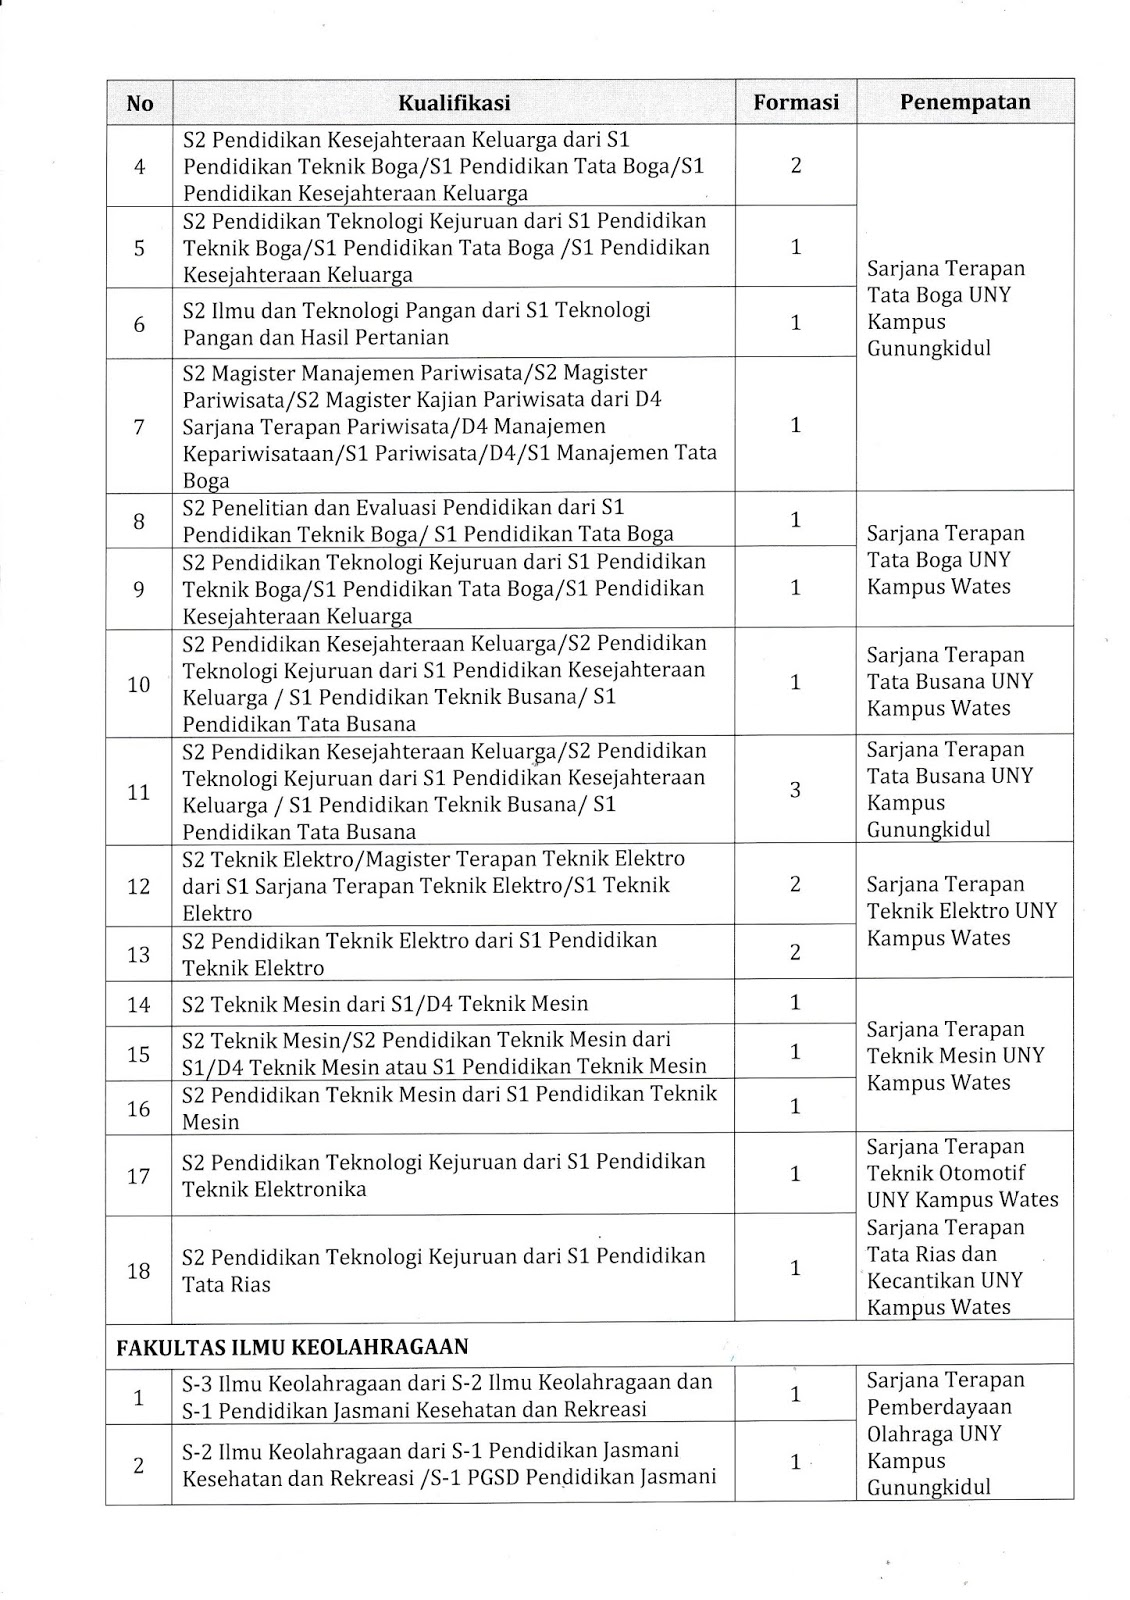 Seleksi Penerimaan Dosen Universitas Negeri Yogyakarta